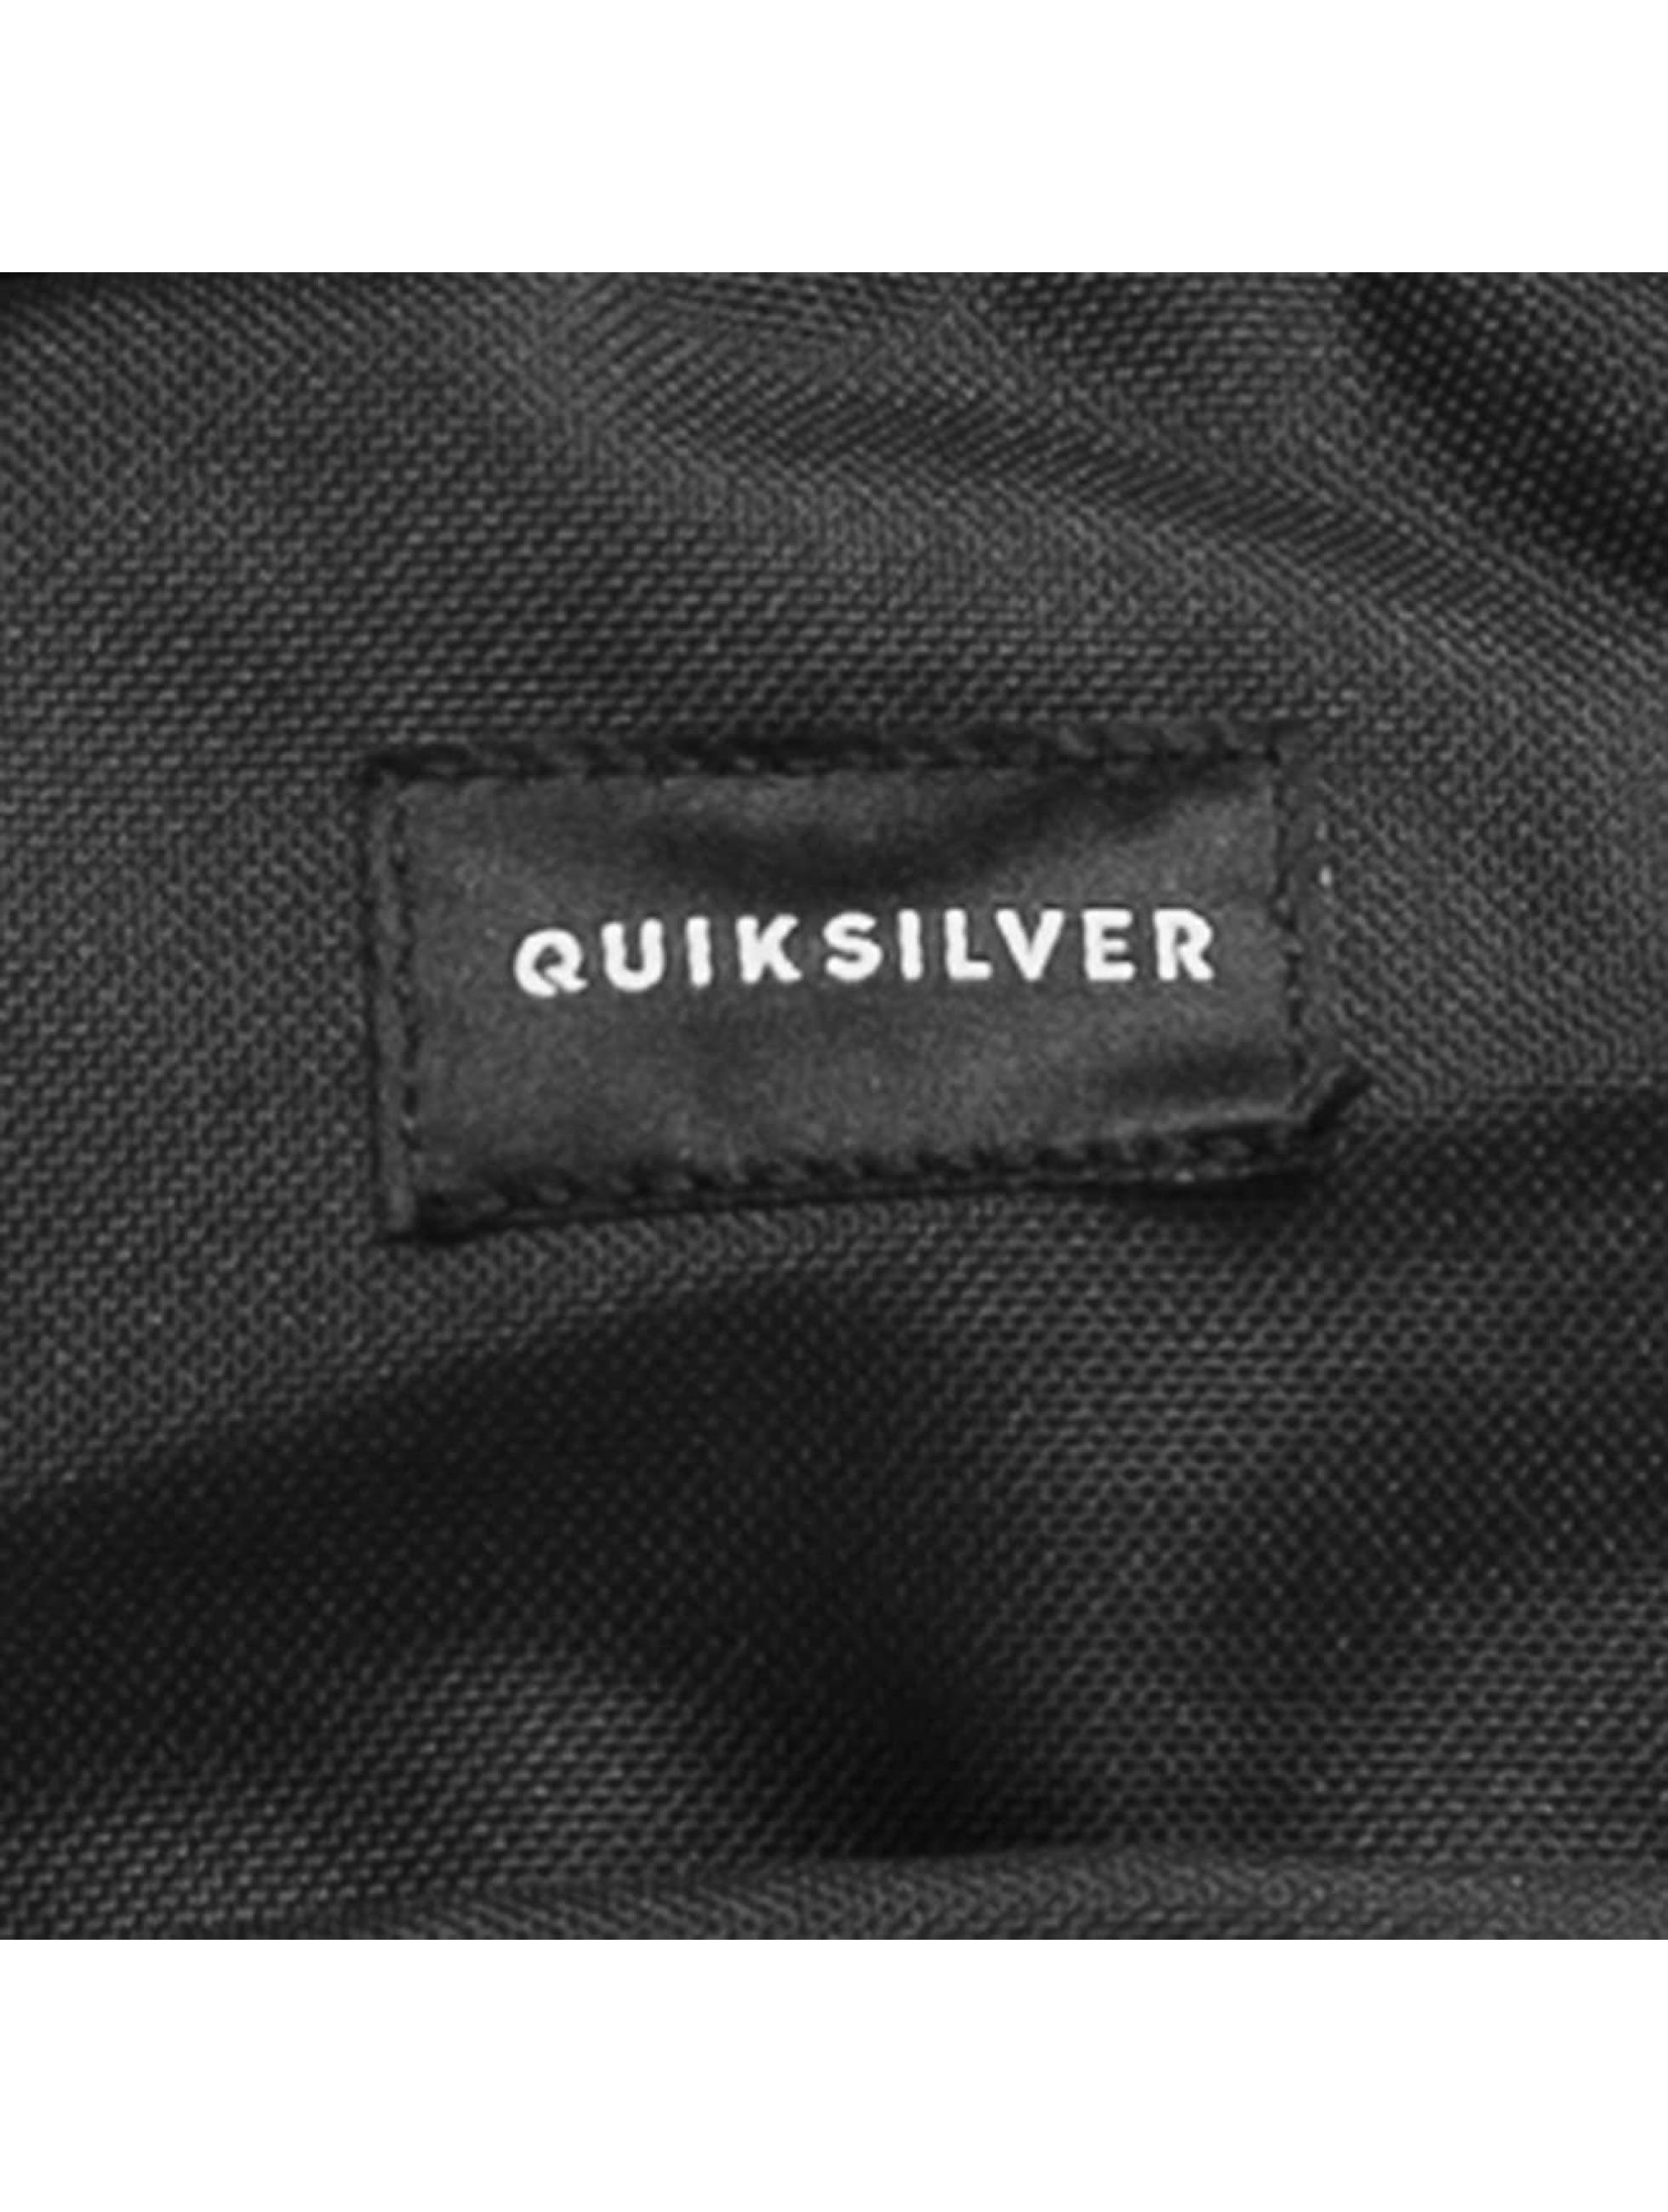 Quiksilver rugzak Burst zwart